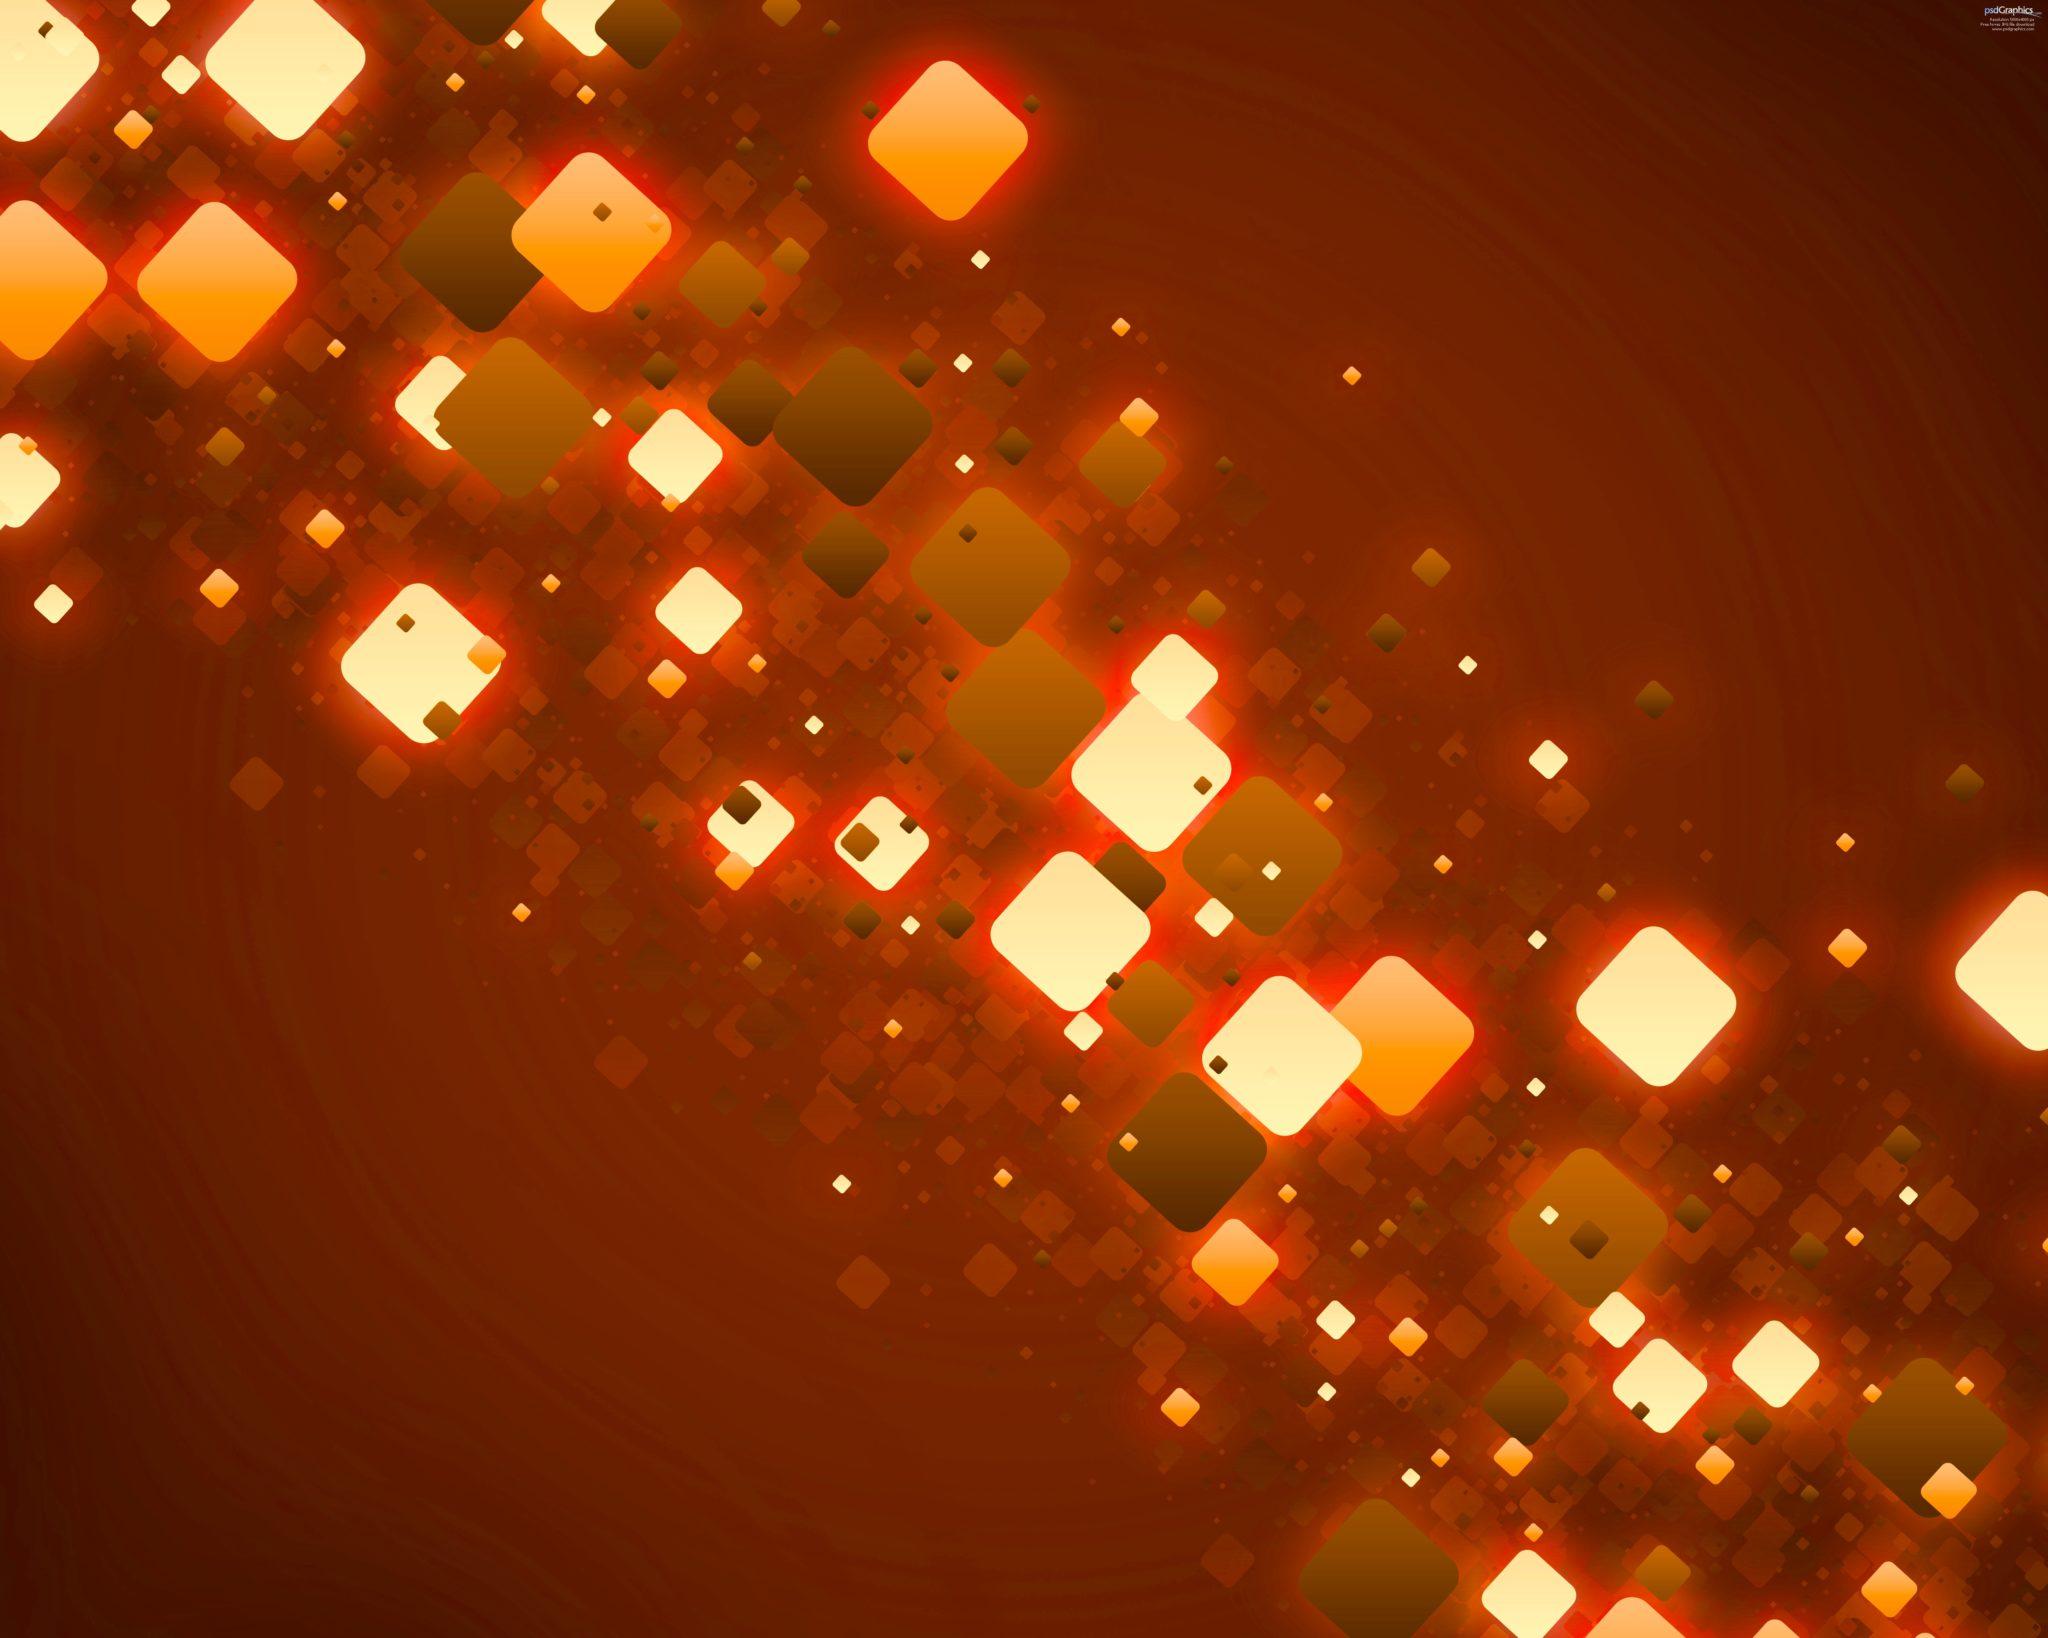 Orange Lights Template for Keynote  Free iWork Templates